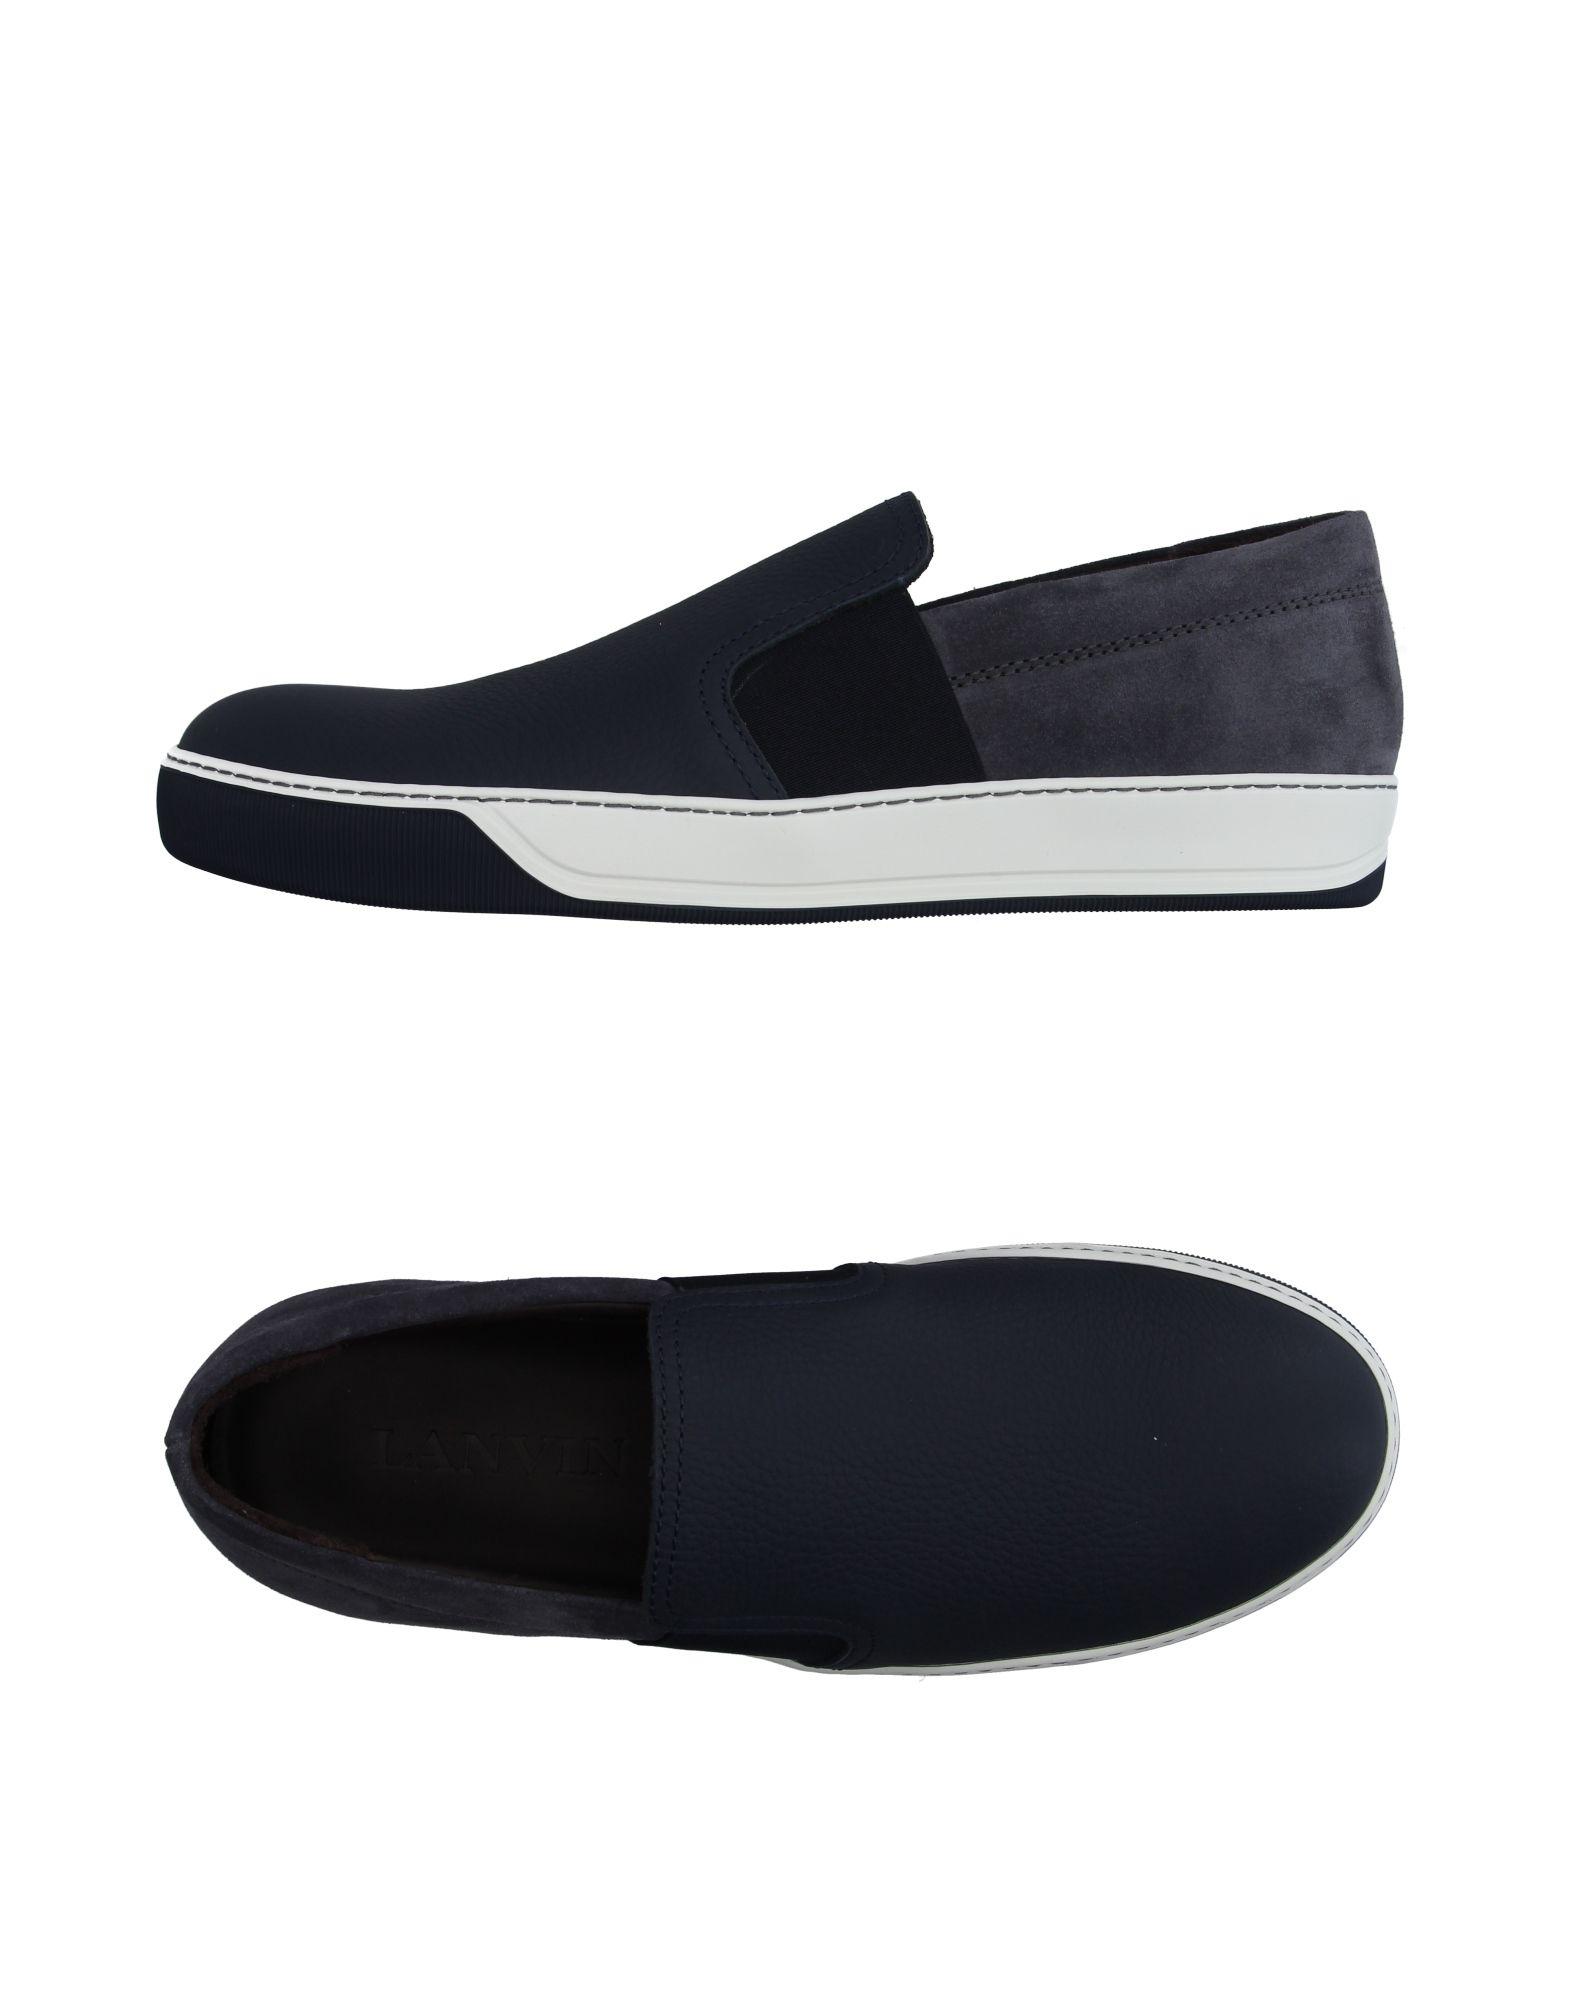 Lanvin Sneakers - Men Lanvin Sneakers online on 11140499VK  United Kingdom - 11140499VK on dbdceb